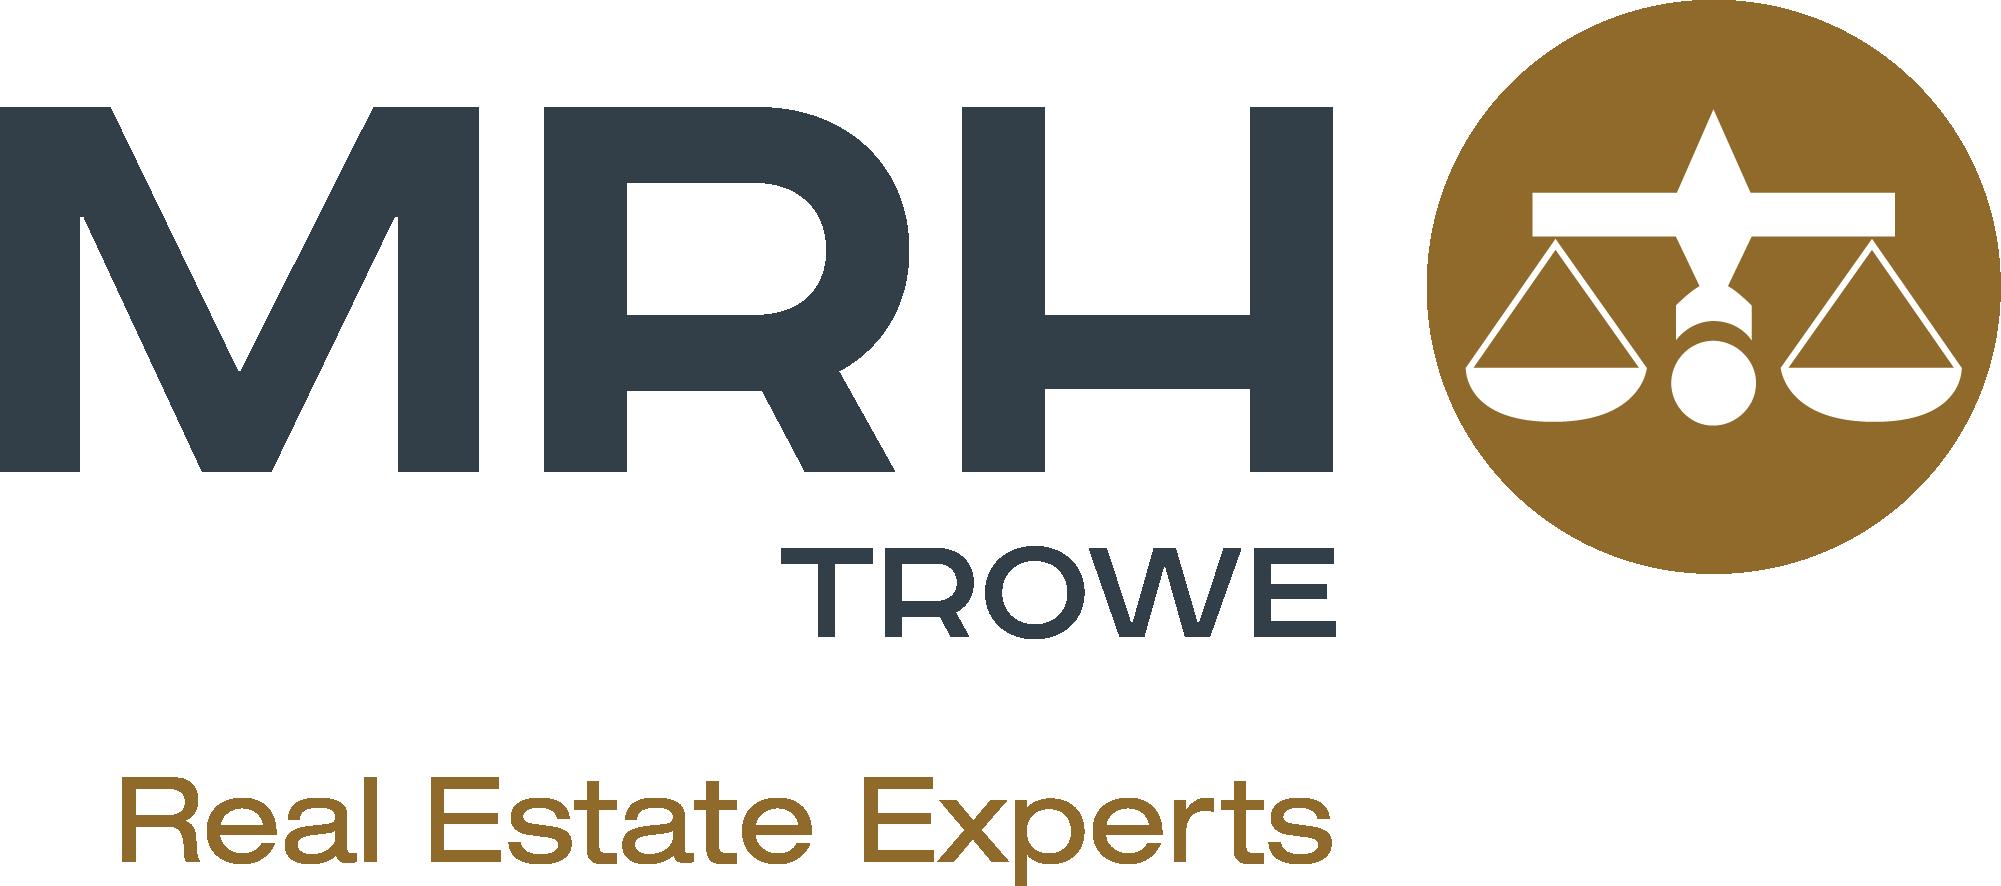 MRH Trowe Real Estate Experts Logo